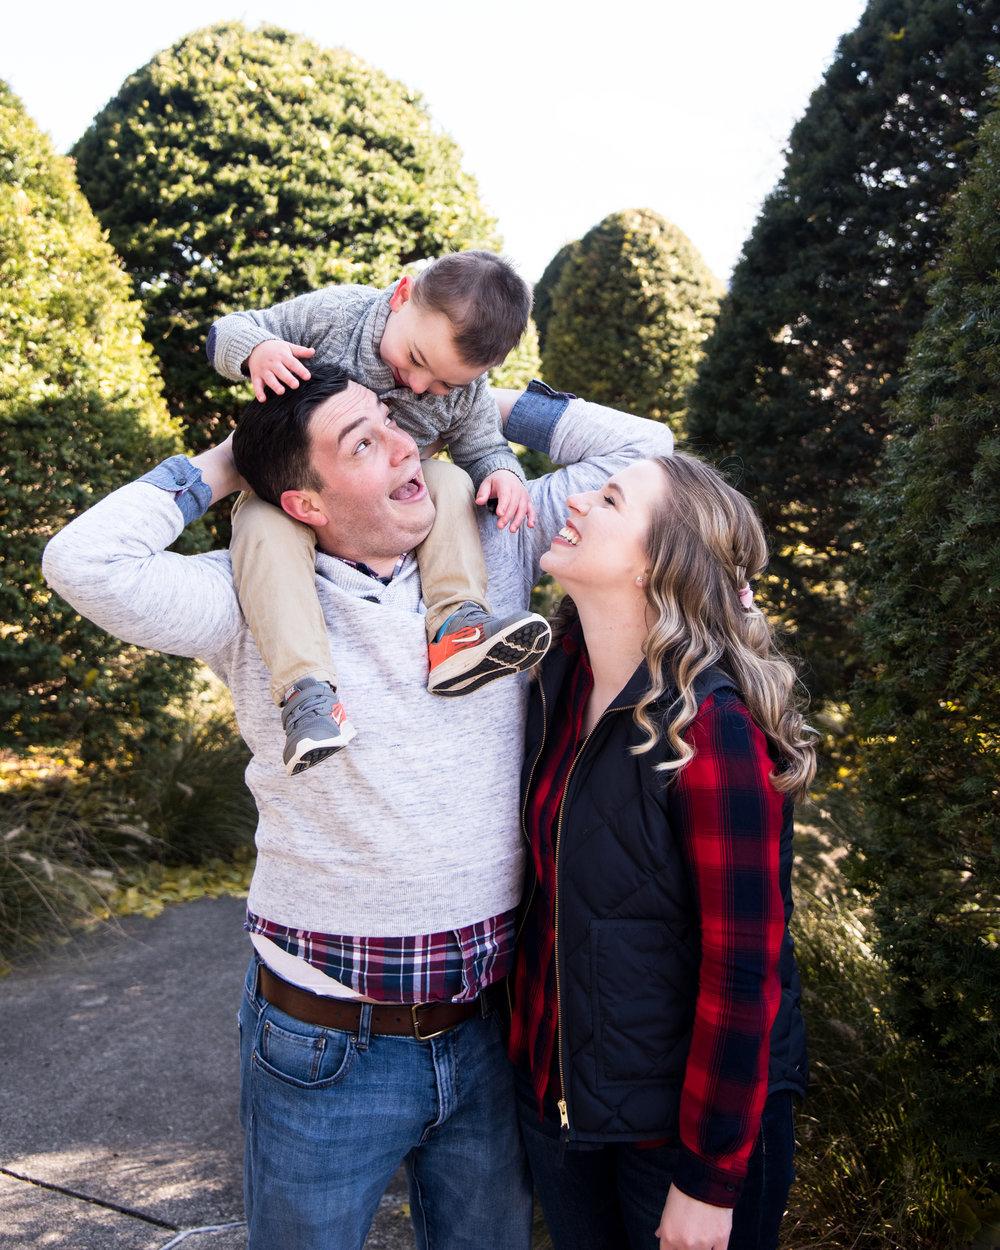 Kyla Jo Photography // Muncie, Indiana // Midwest Photographer // Family Photography in Indiana